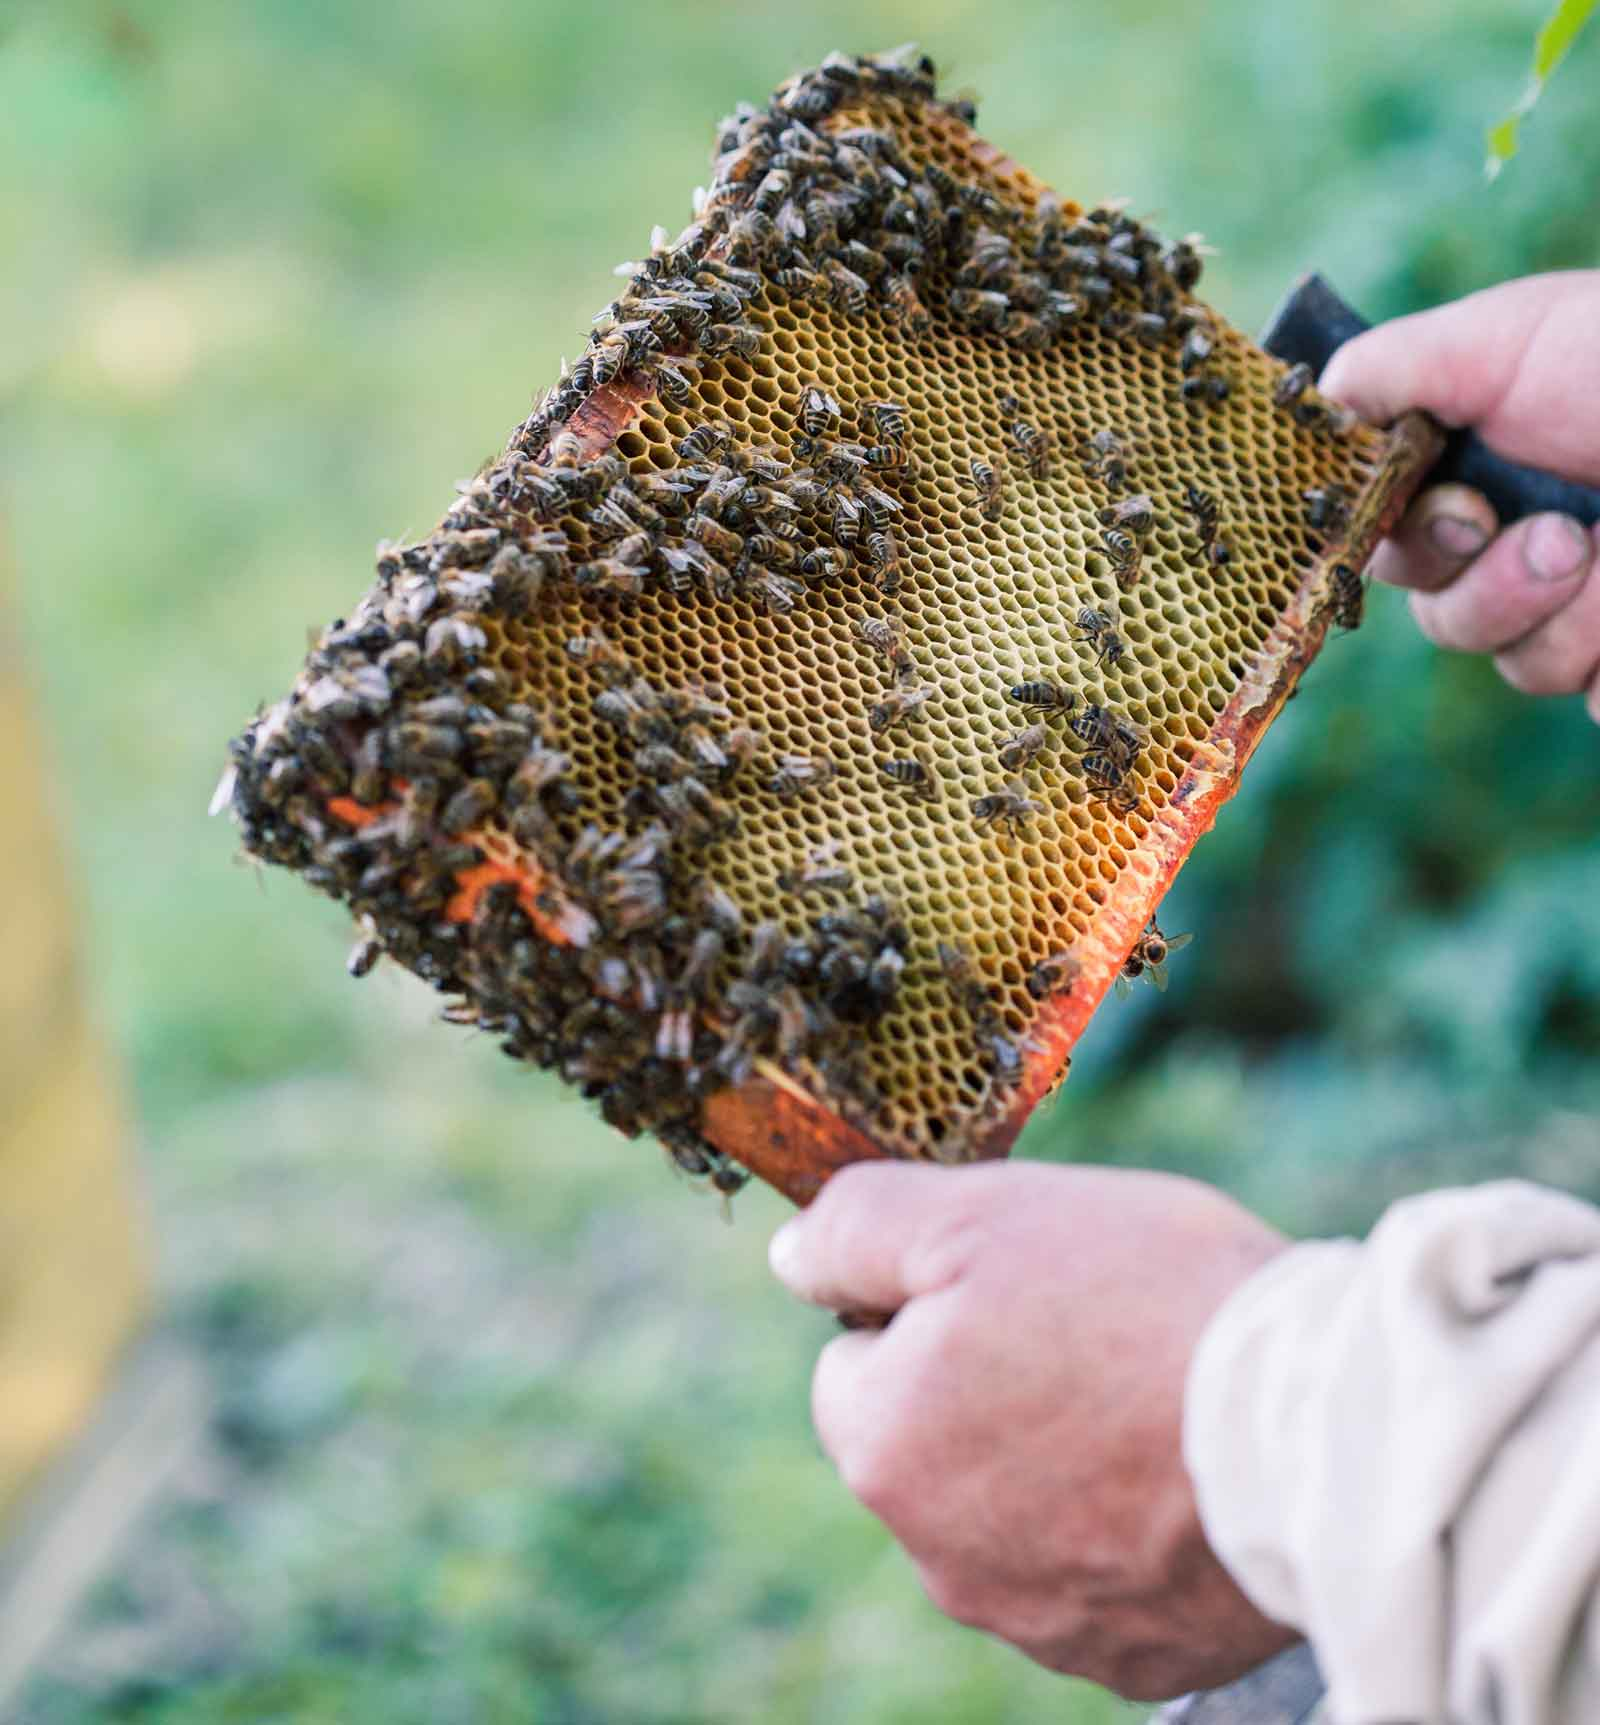 Beekeeper holding tray